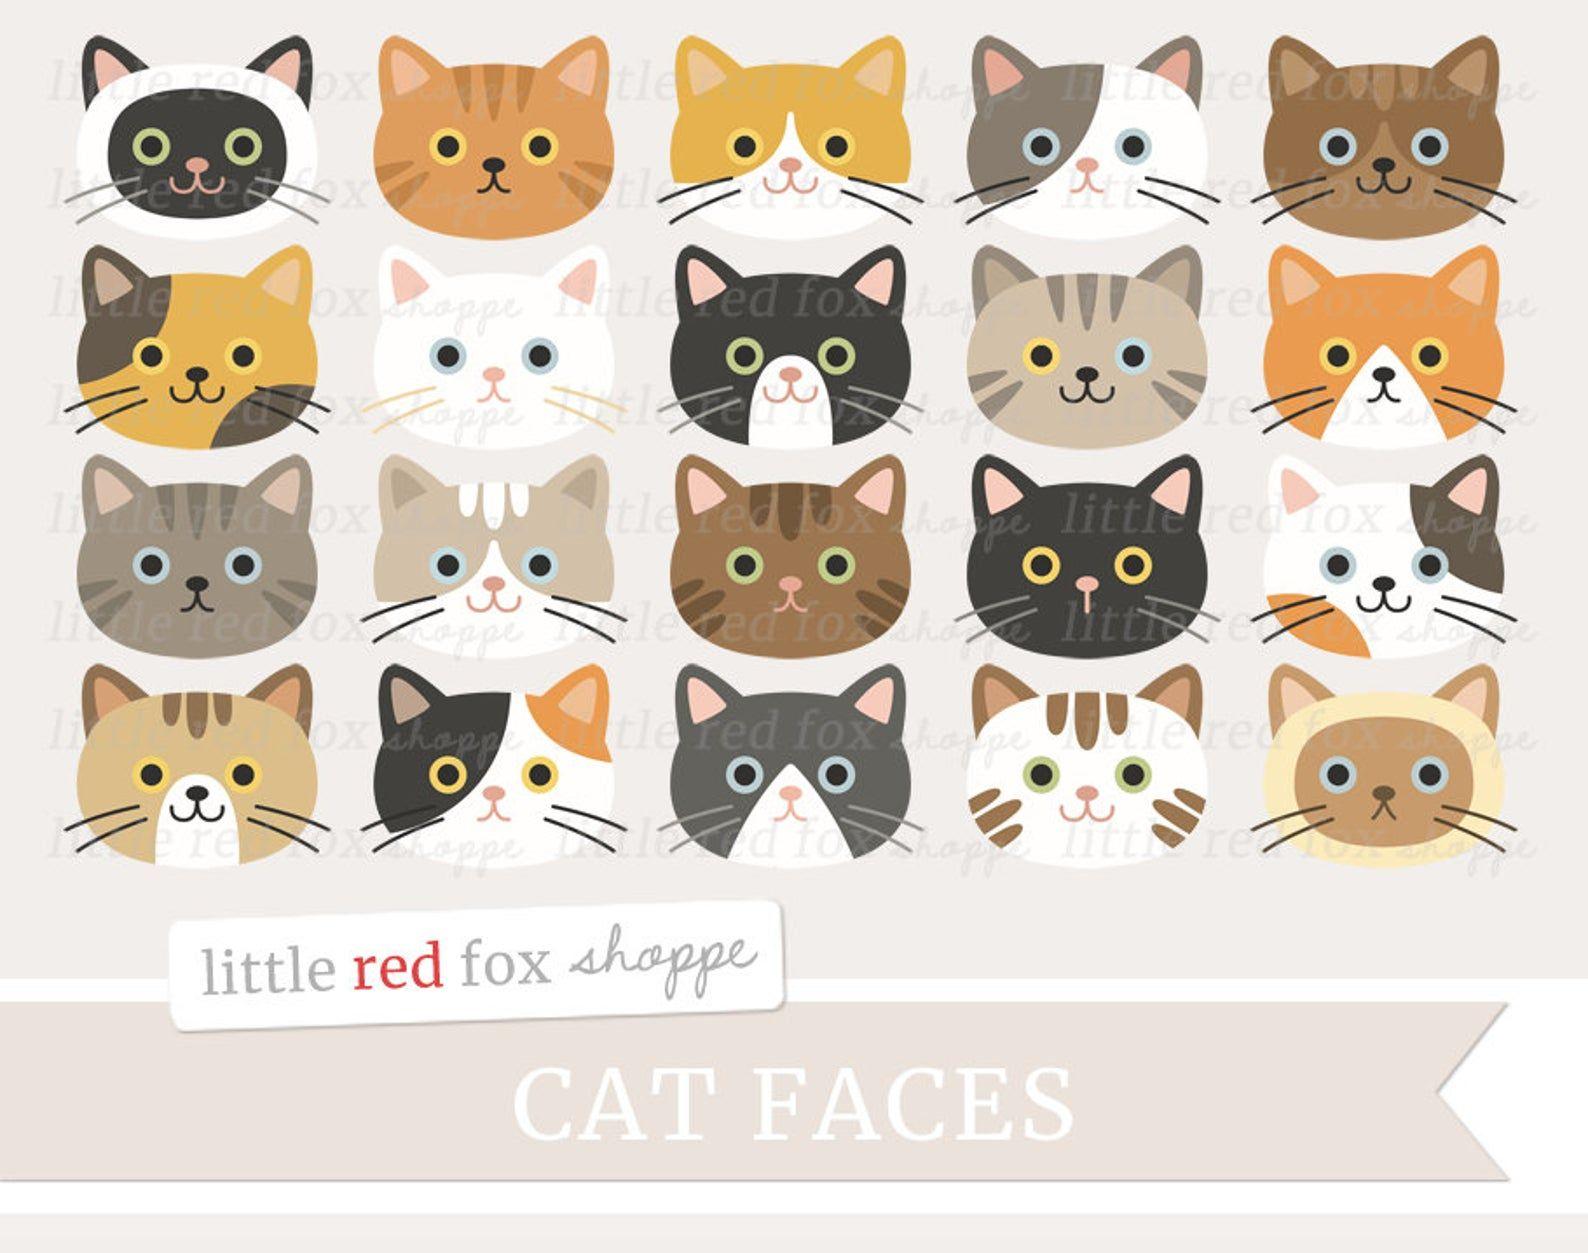 Cat Face Clipart Cat Clip Art Kitty Clipart Kitten Clipart Etsy Cat Clipart Digital Graphic Design Cat Face